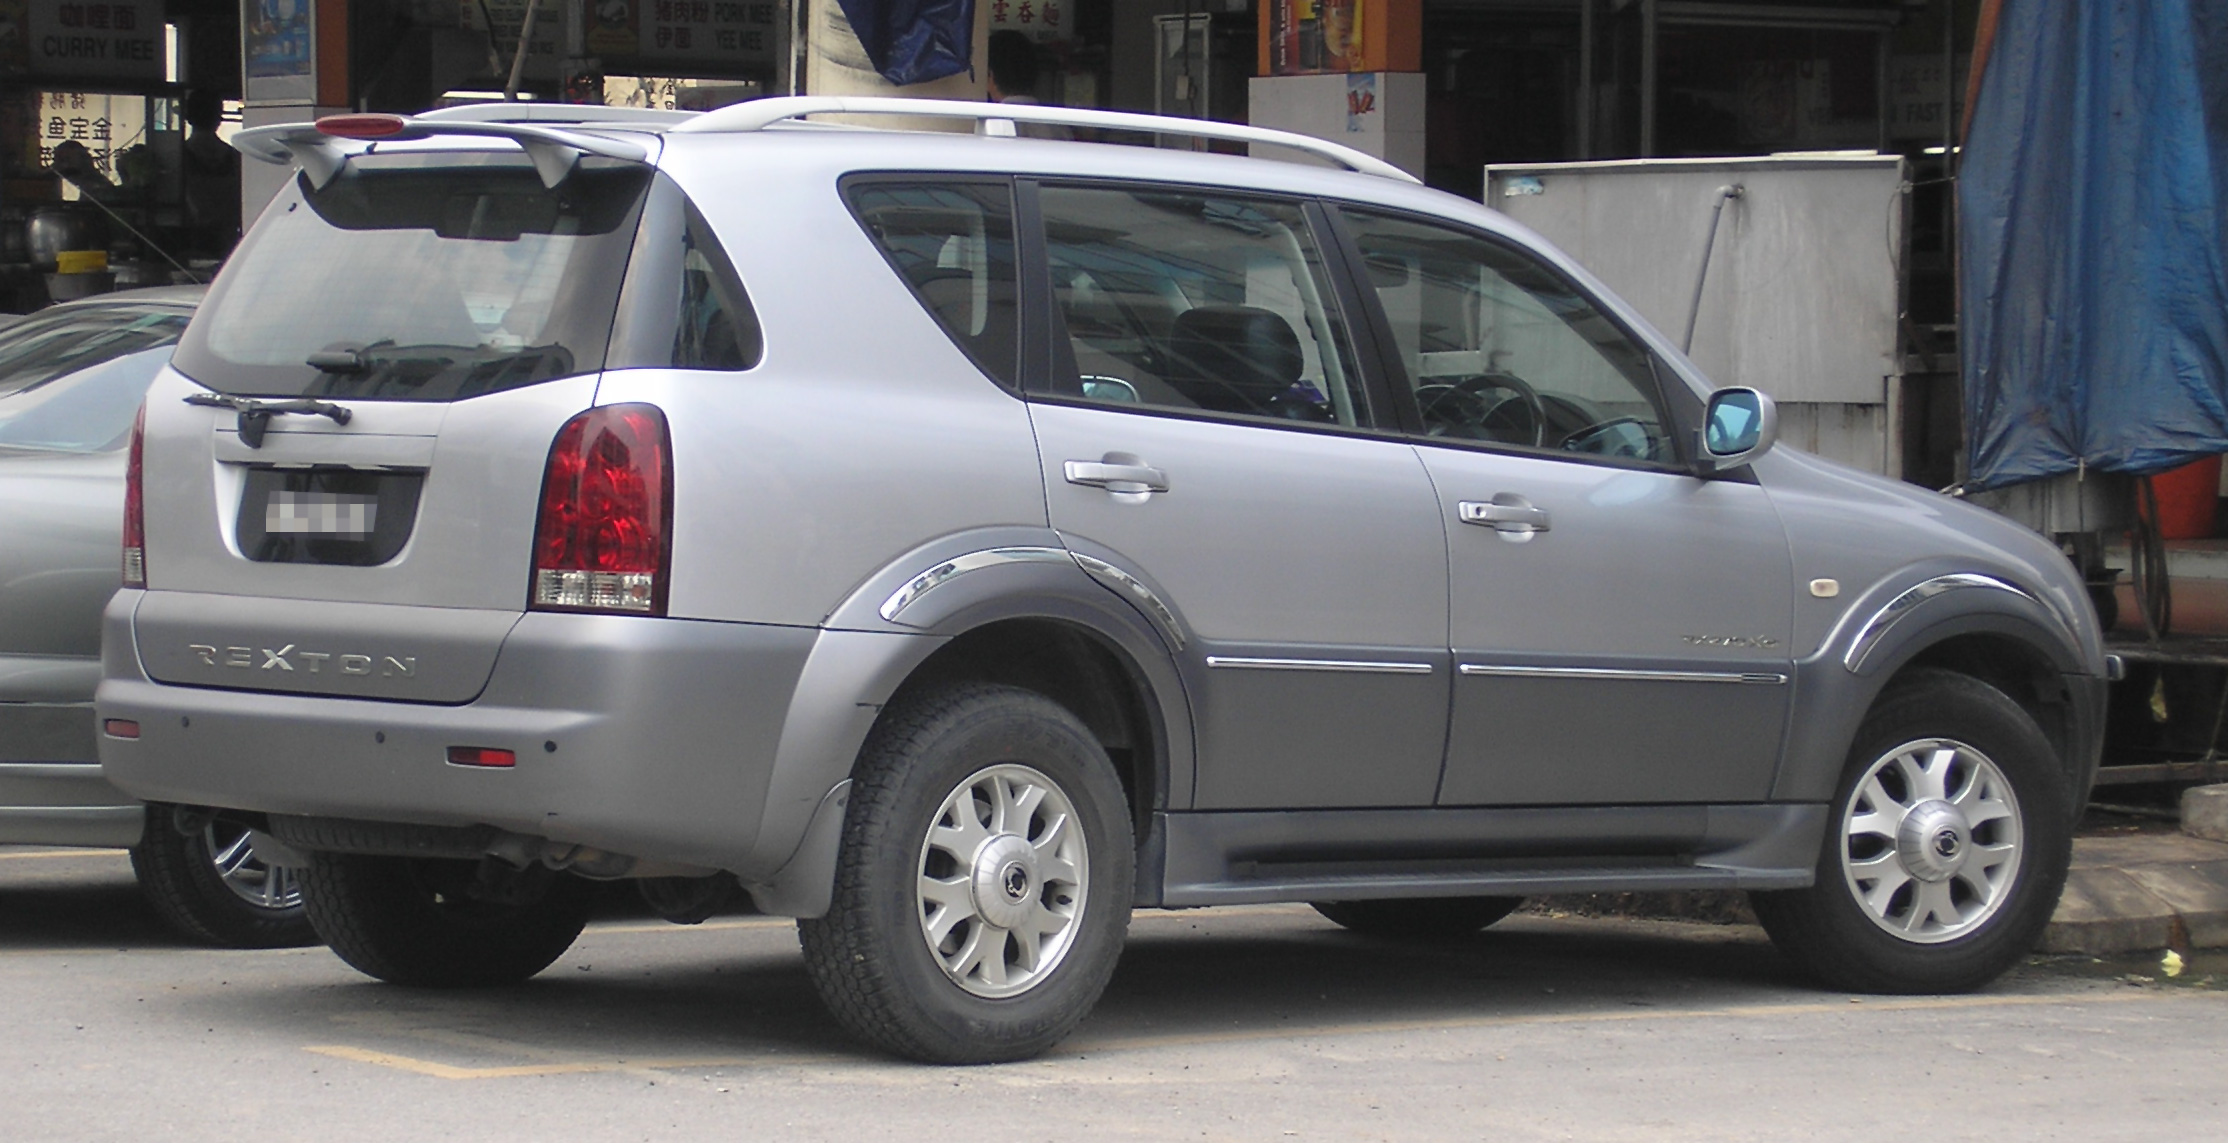 SsangYong Rexton I 2002 - 2006 SUV 5 door #6